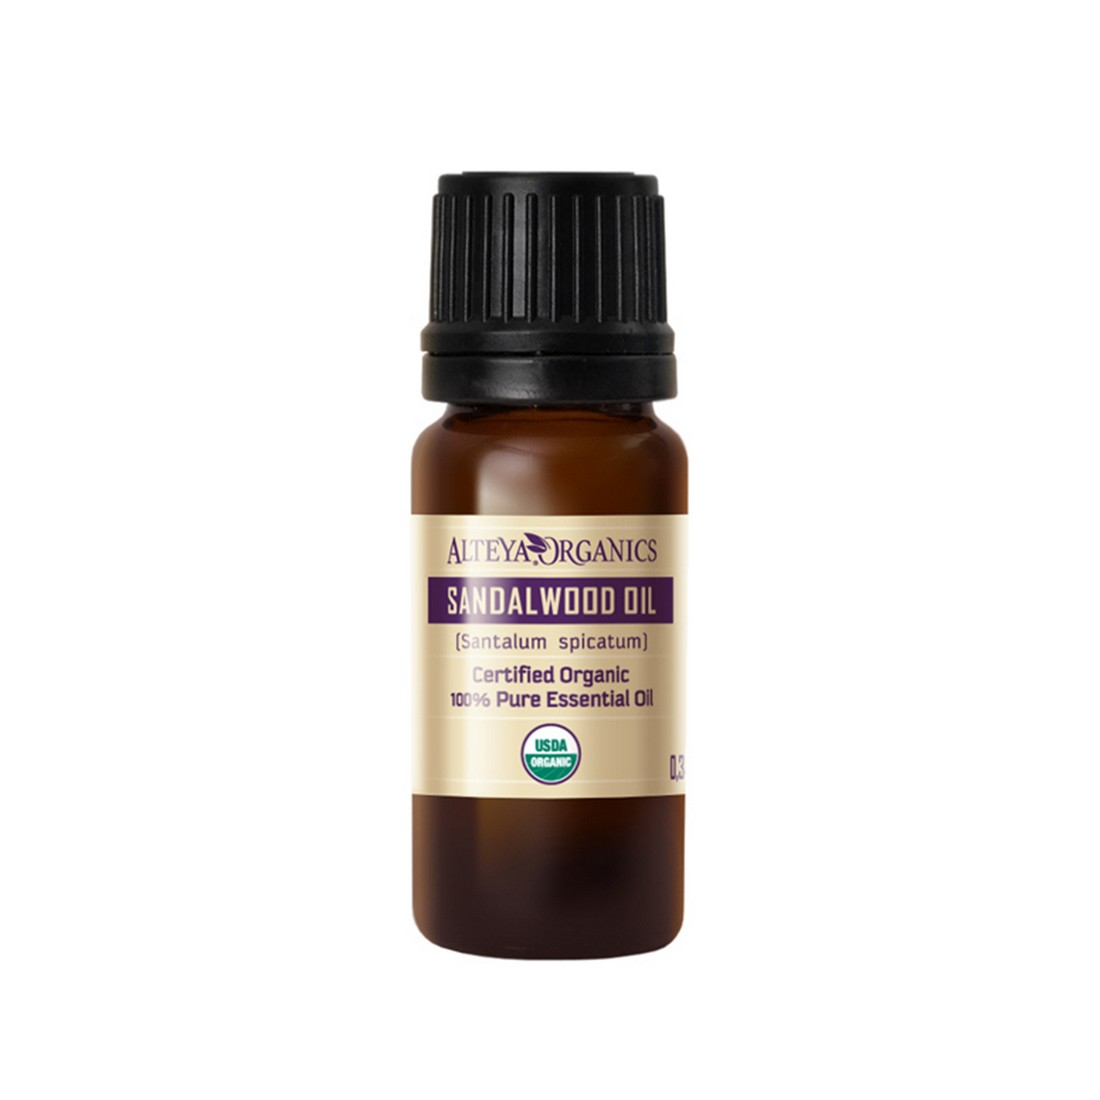 Bio organic sandalwood essential oil Alteya Organics 10 ml.